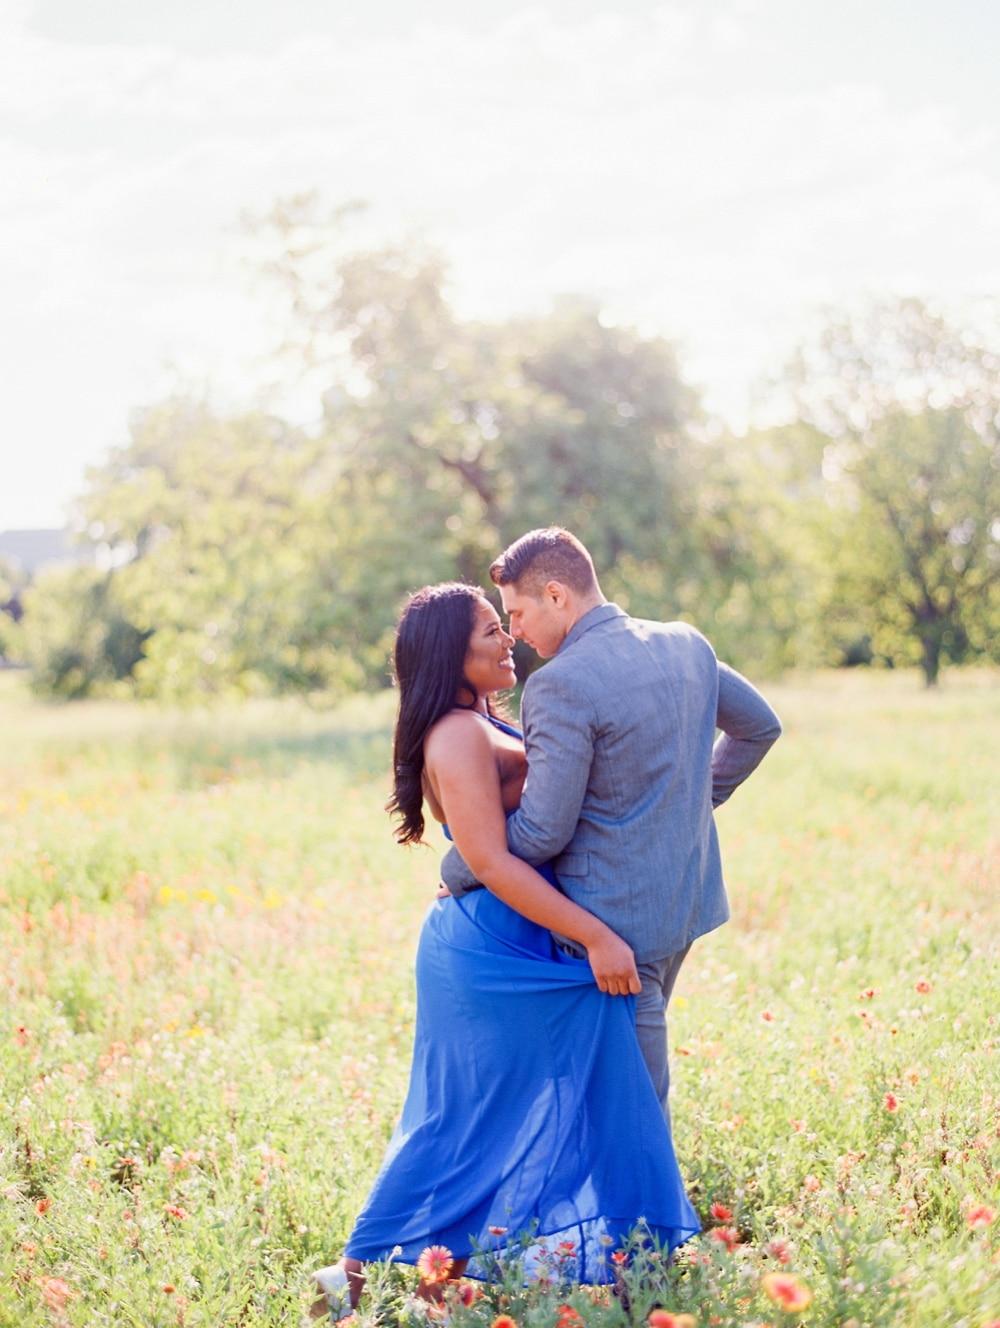 kristin-la-voie-photography-austin-wedding-photographer-29